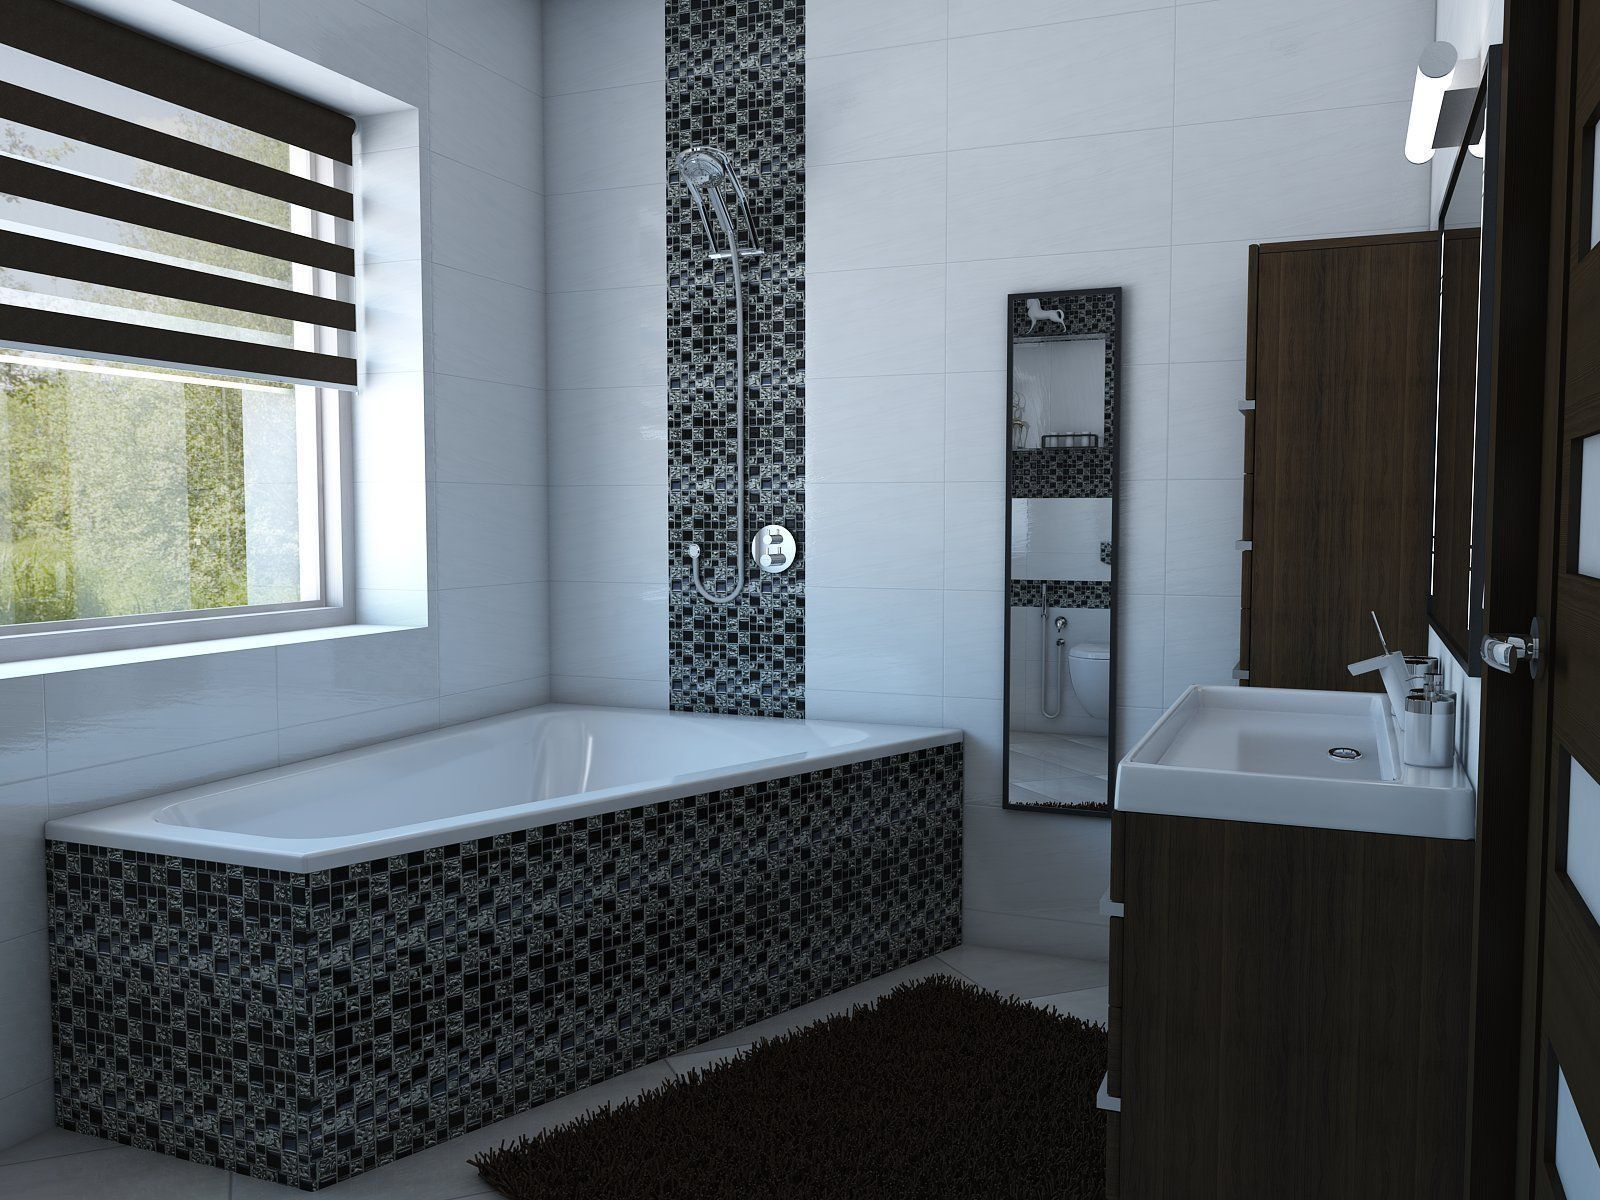 Bathroom Model bathroom with angular bath 3d model max obj 3ds fbx skp